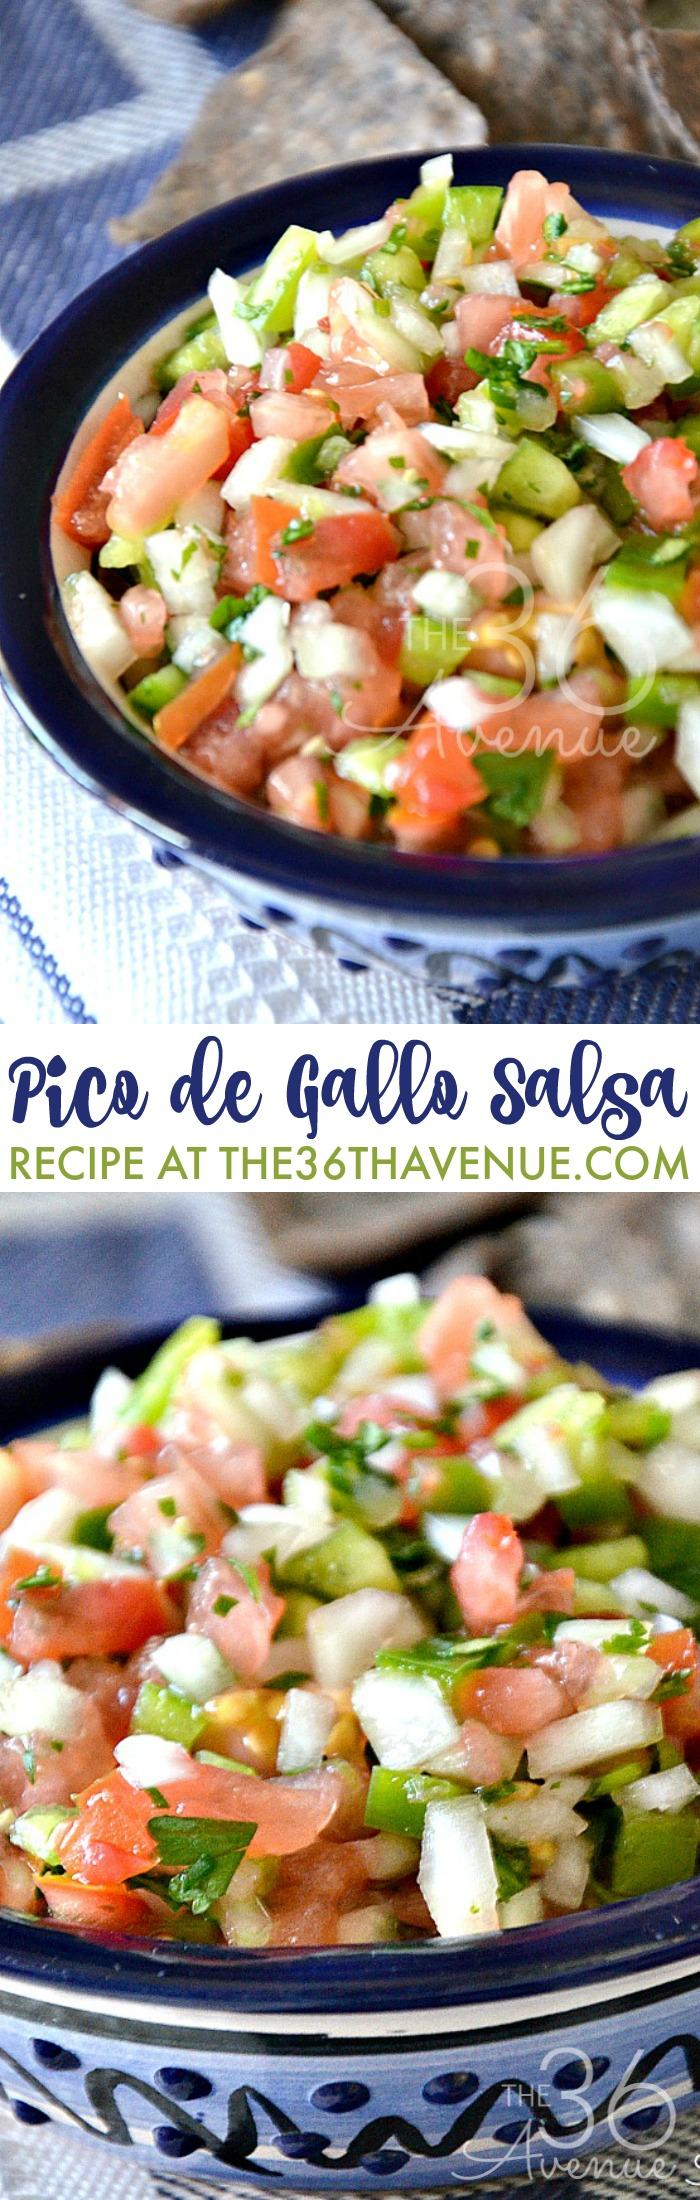 Pico de Gallo Fresh Salsa Recipe - This is the best salsa I've ever had!